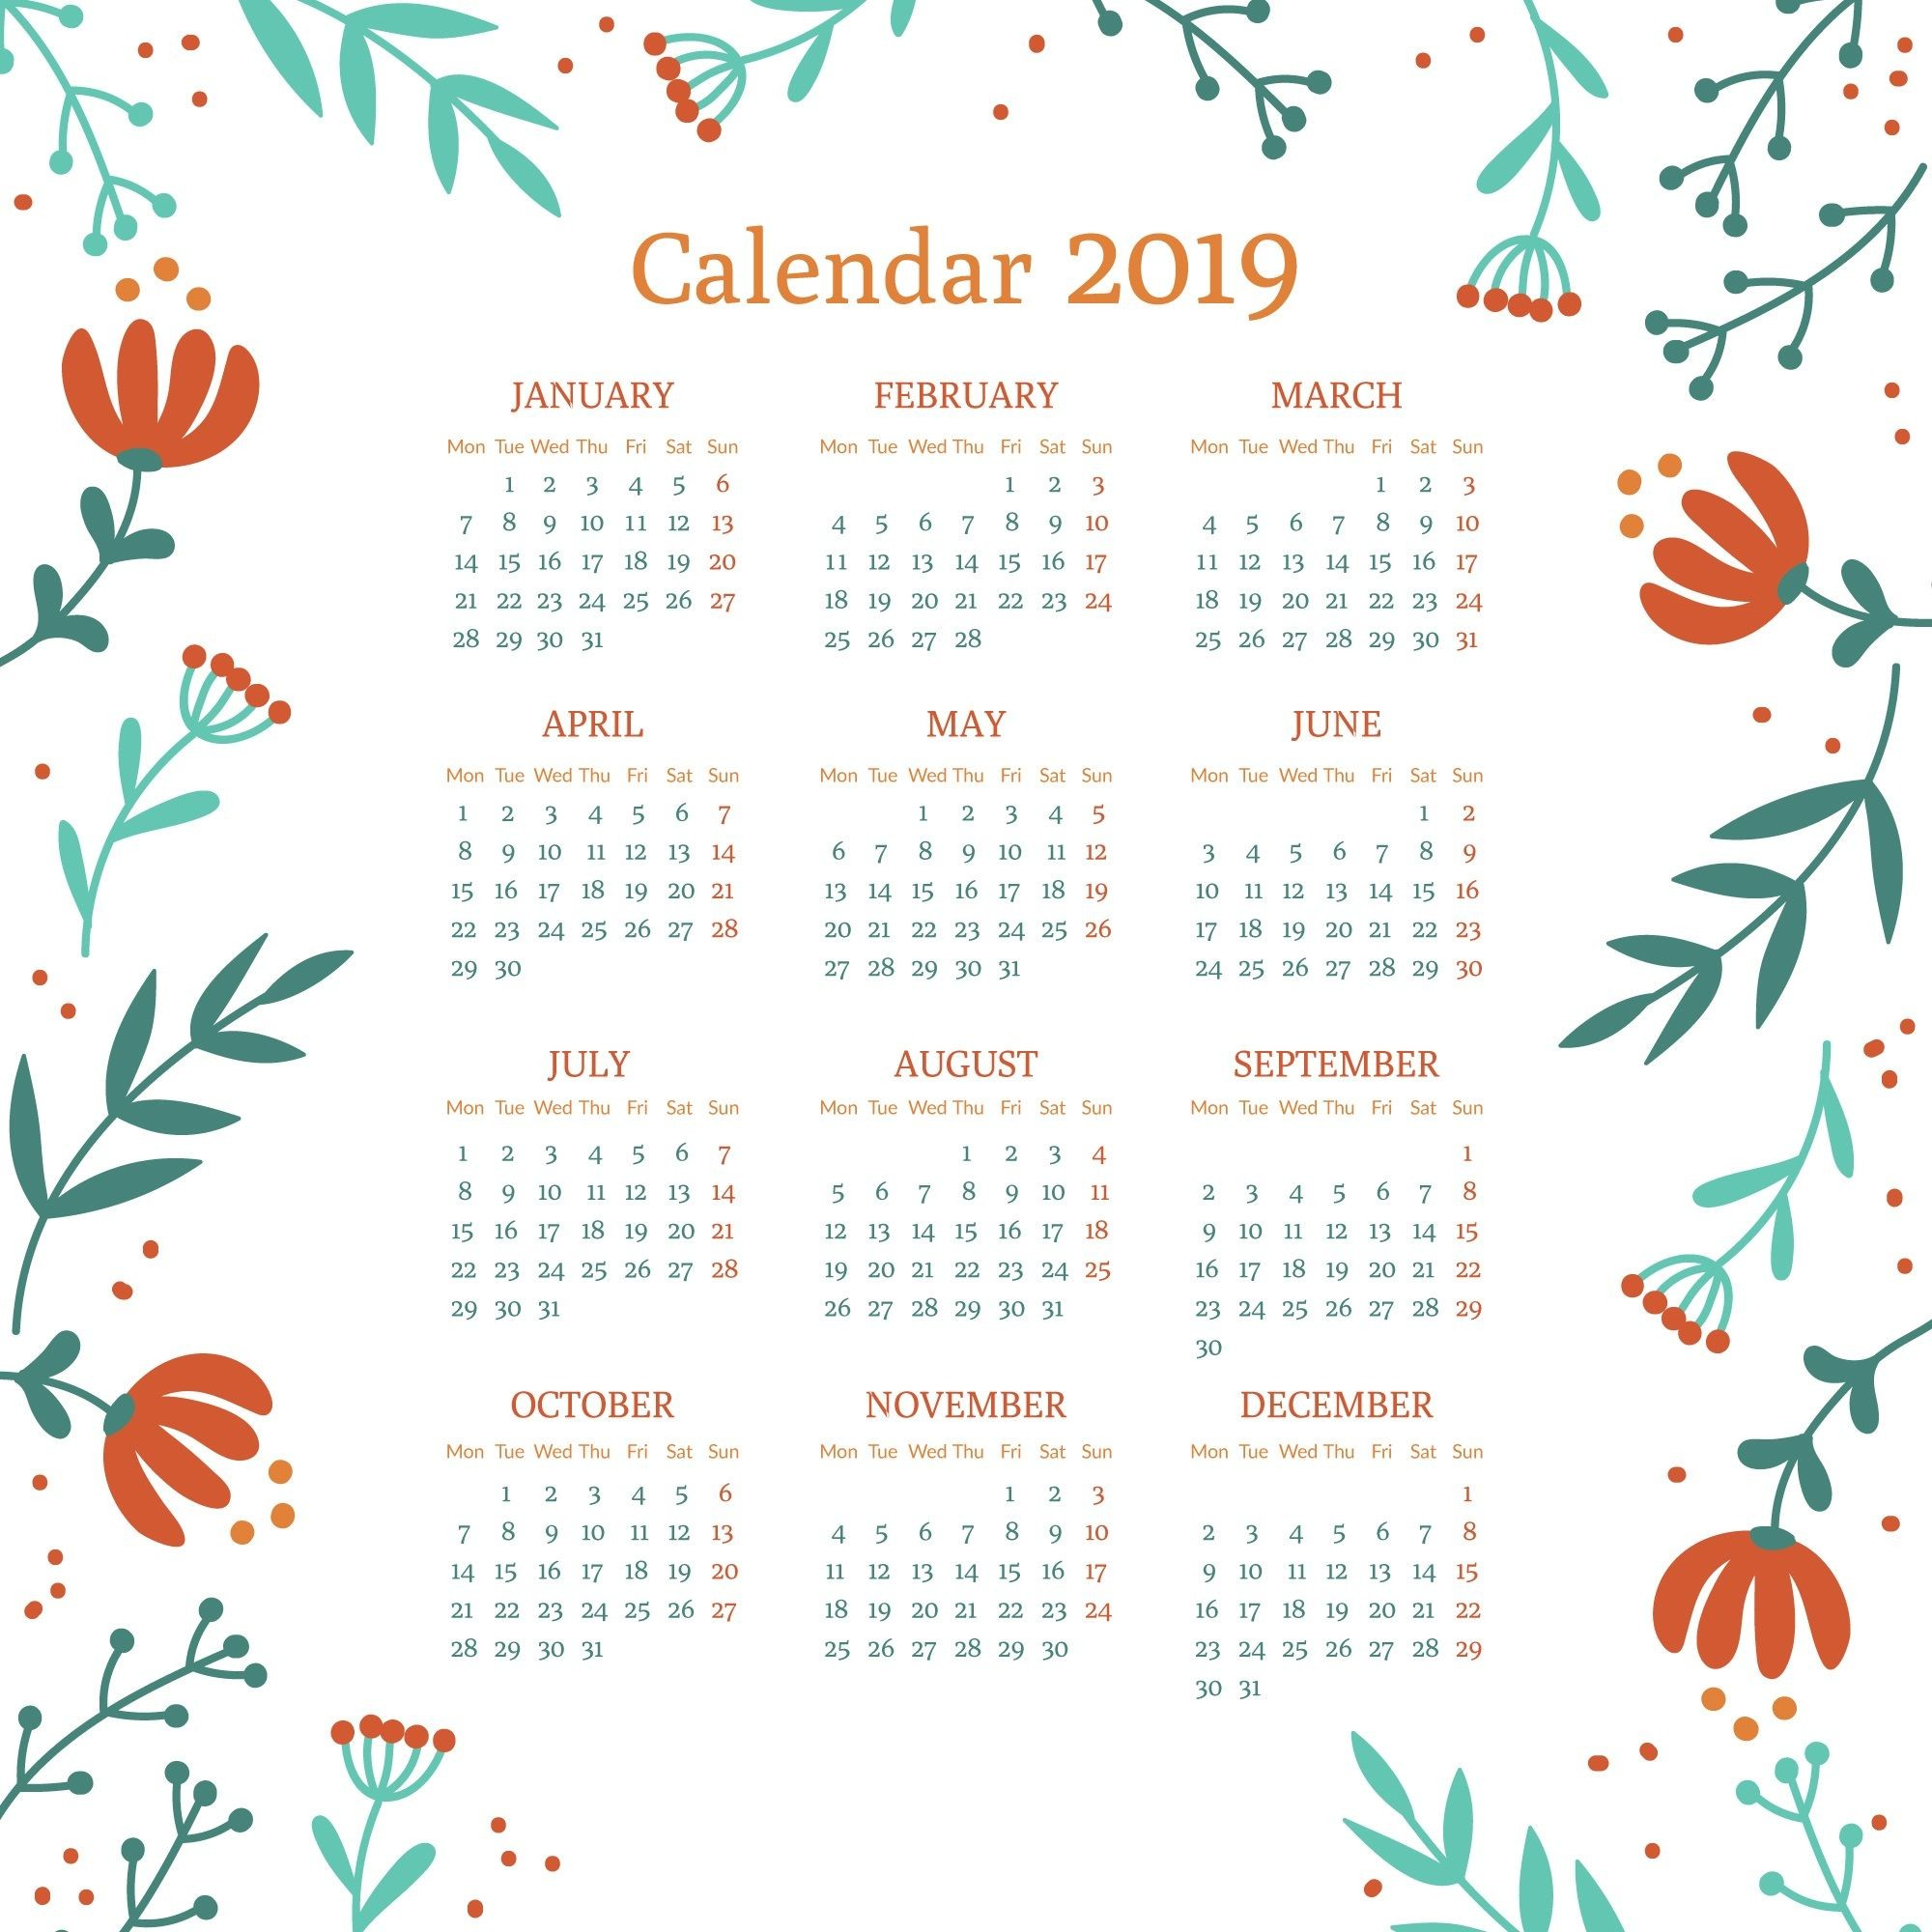 Calendario Anual Imprimir 2019 Más Populares Calendarios 2019 Gratis Para Imprimir ▷ 【pdf Word Excel Of Calendario Anual Imprimir 2019 Más Populares Planner 2020 Panda Menino Calendario Kedvencek